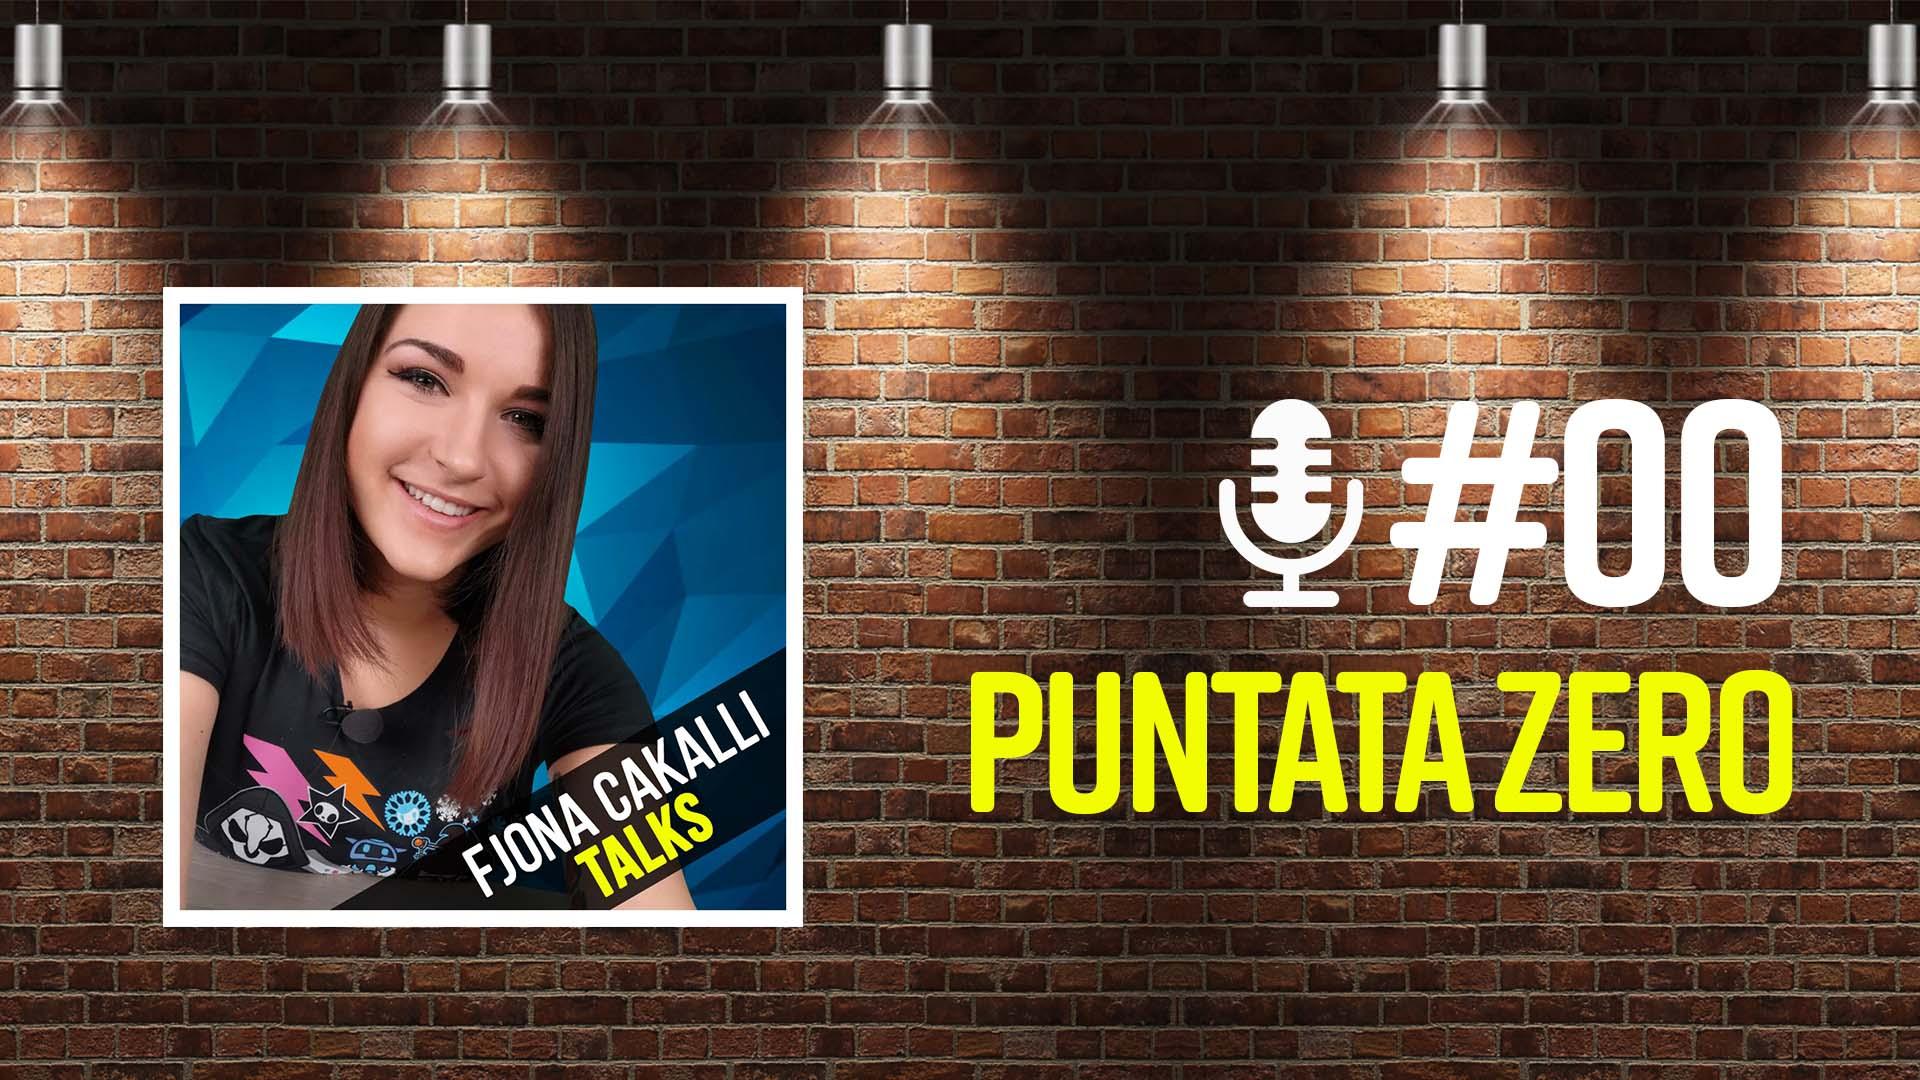 Puntata Zero: Che cos'è il podcast Fjona Cakalli Talks thumbnail